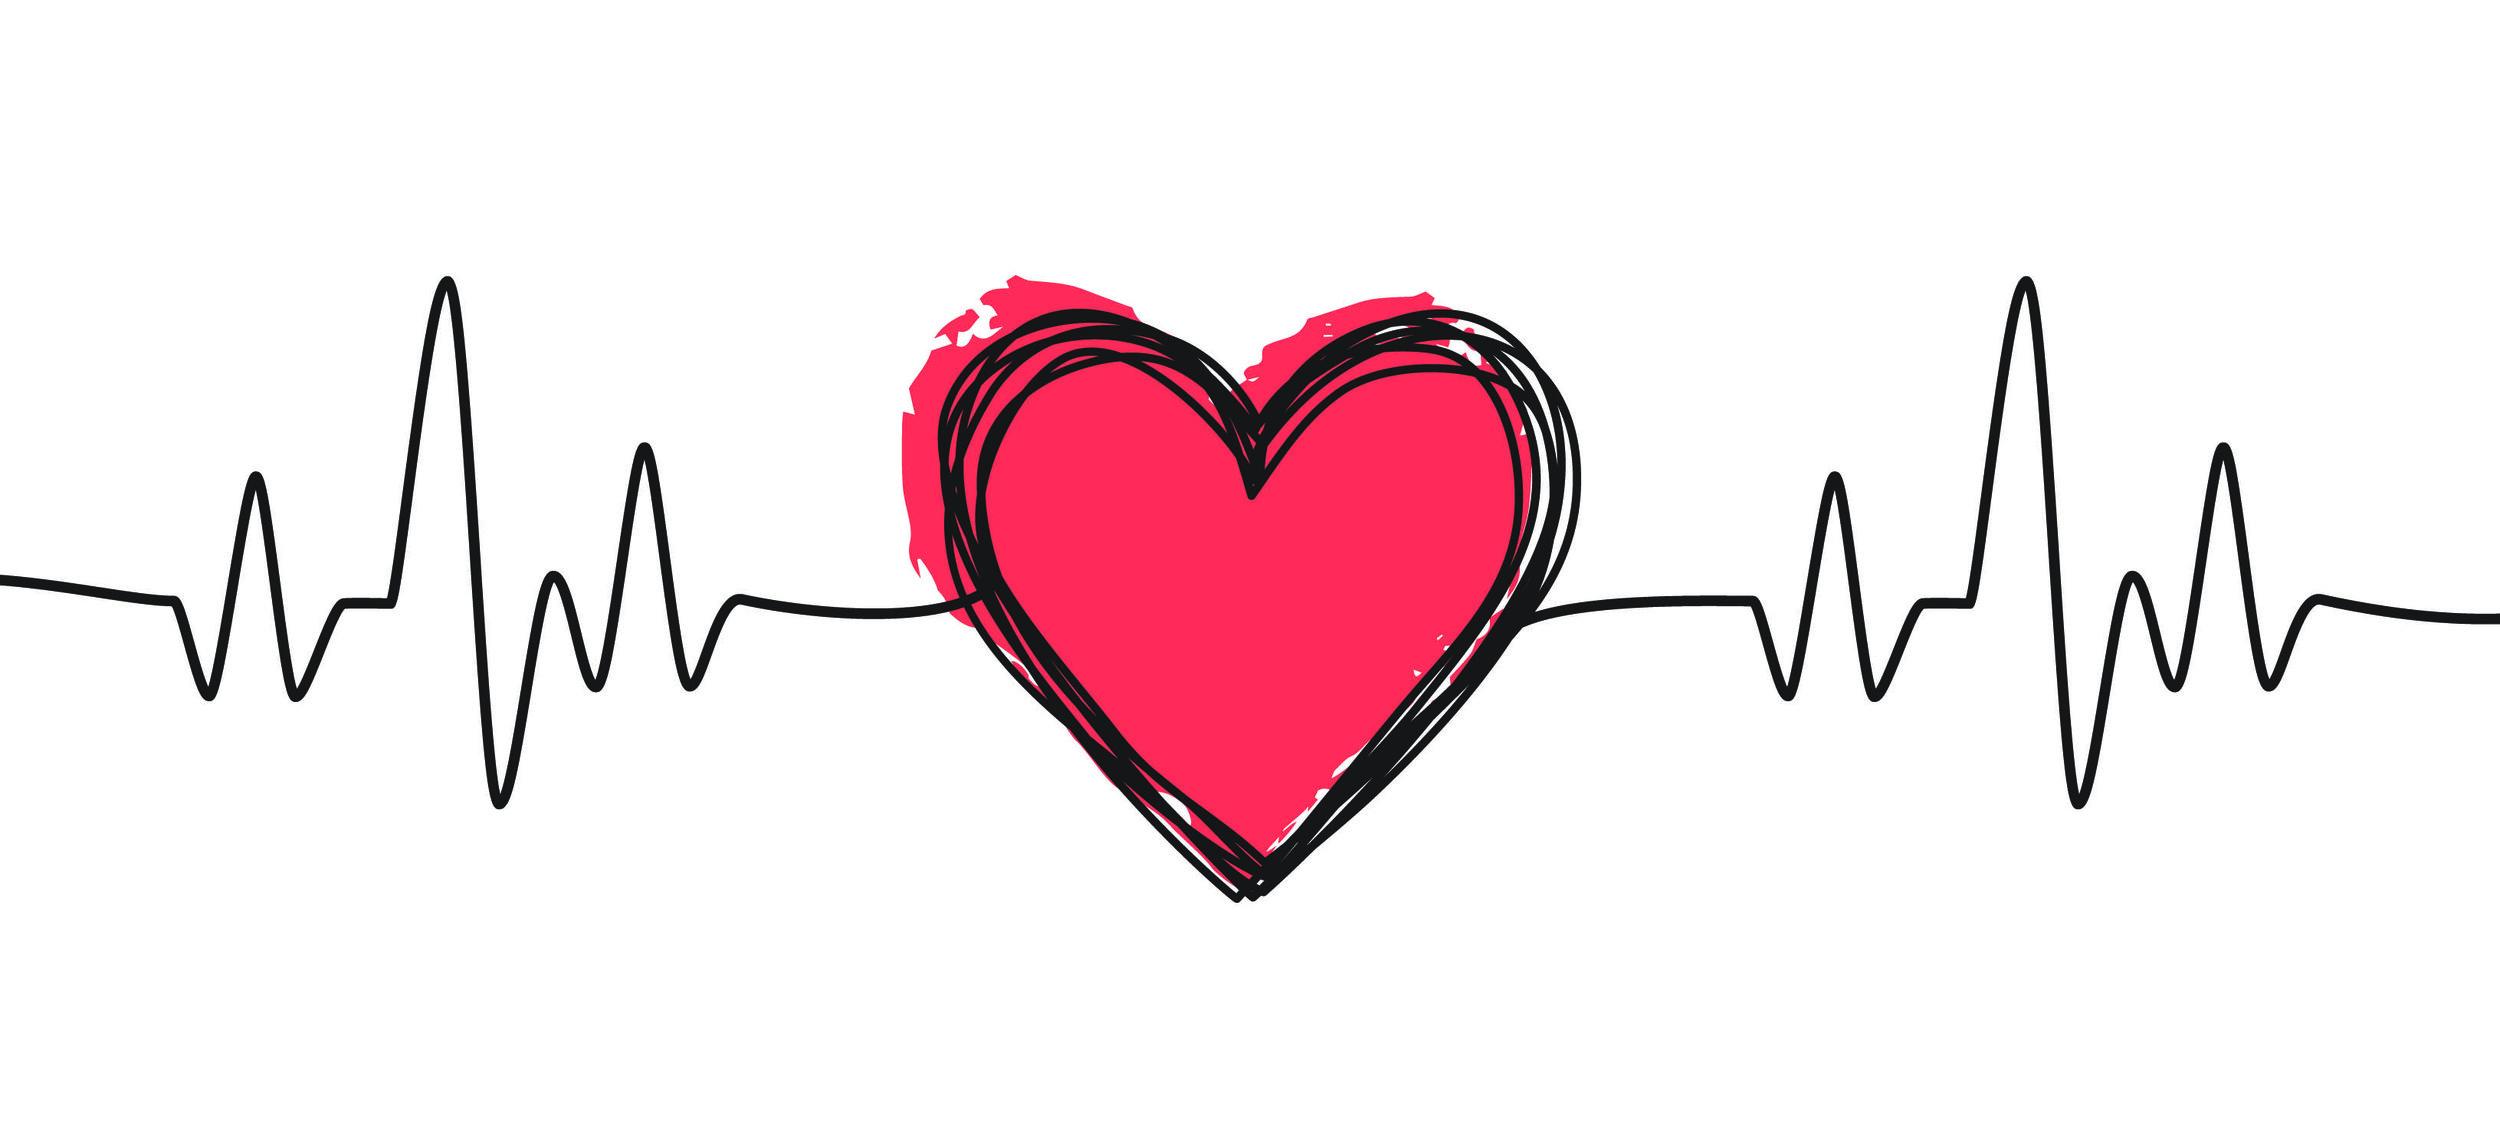 The Heart Heals